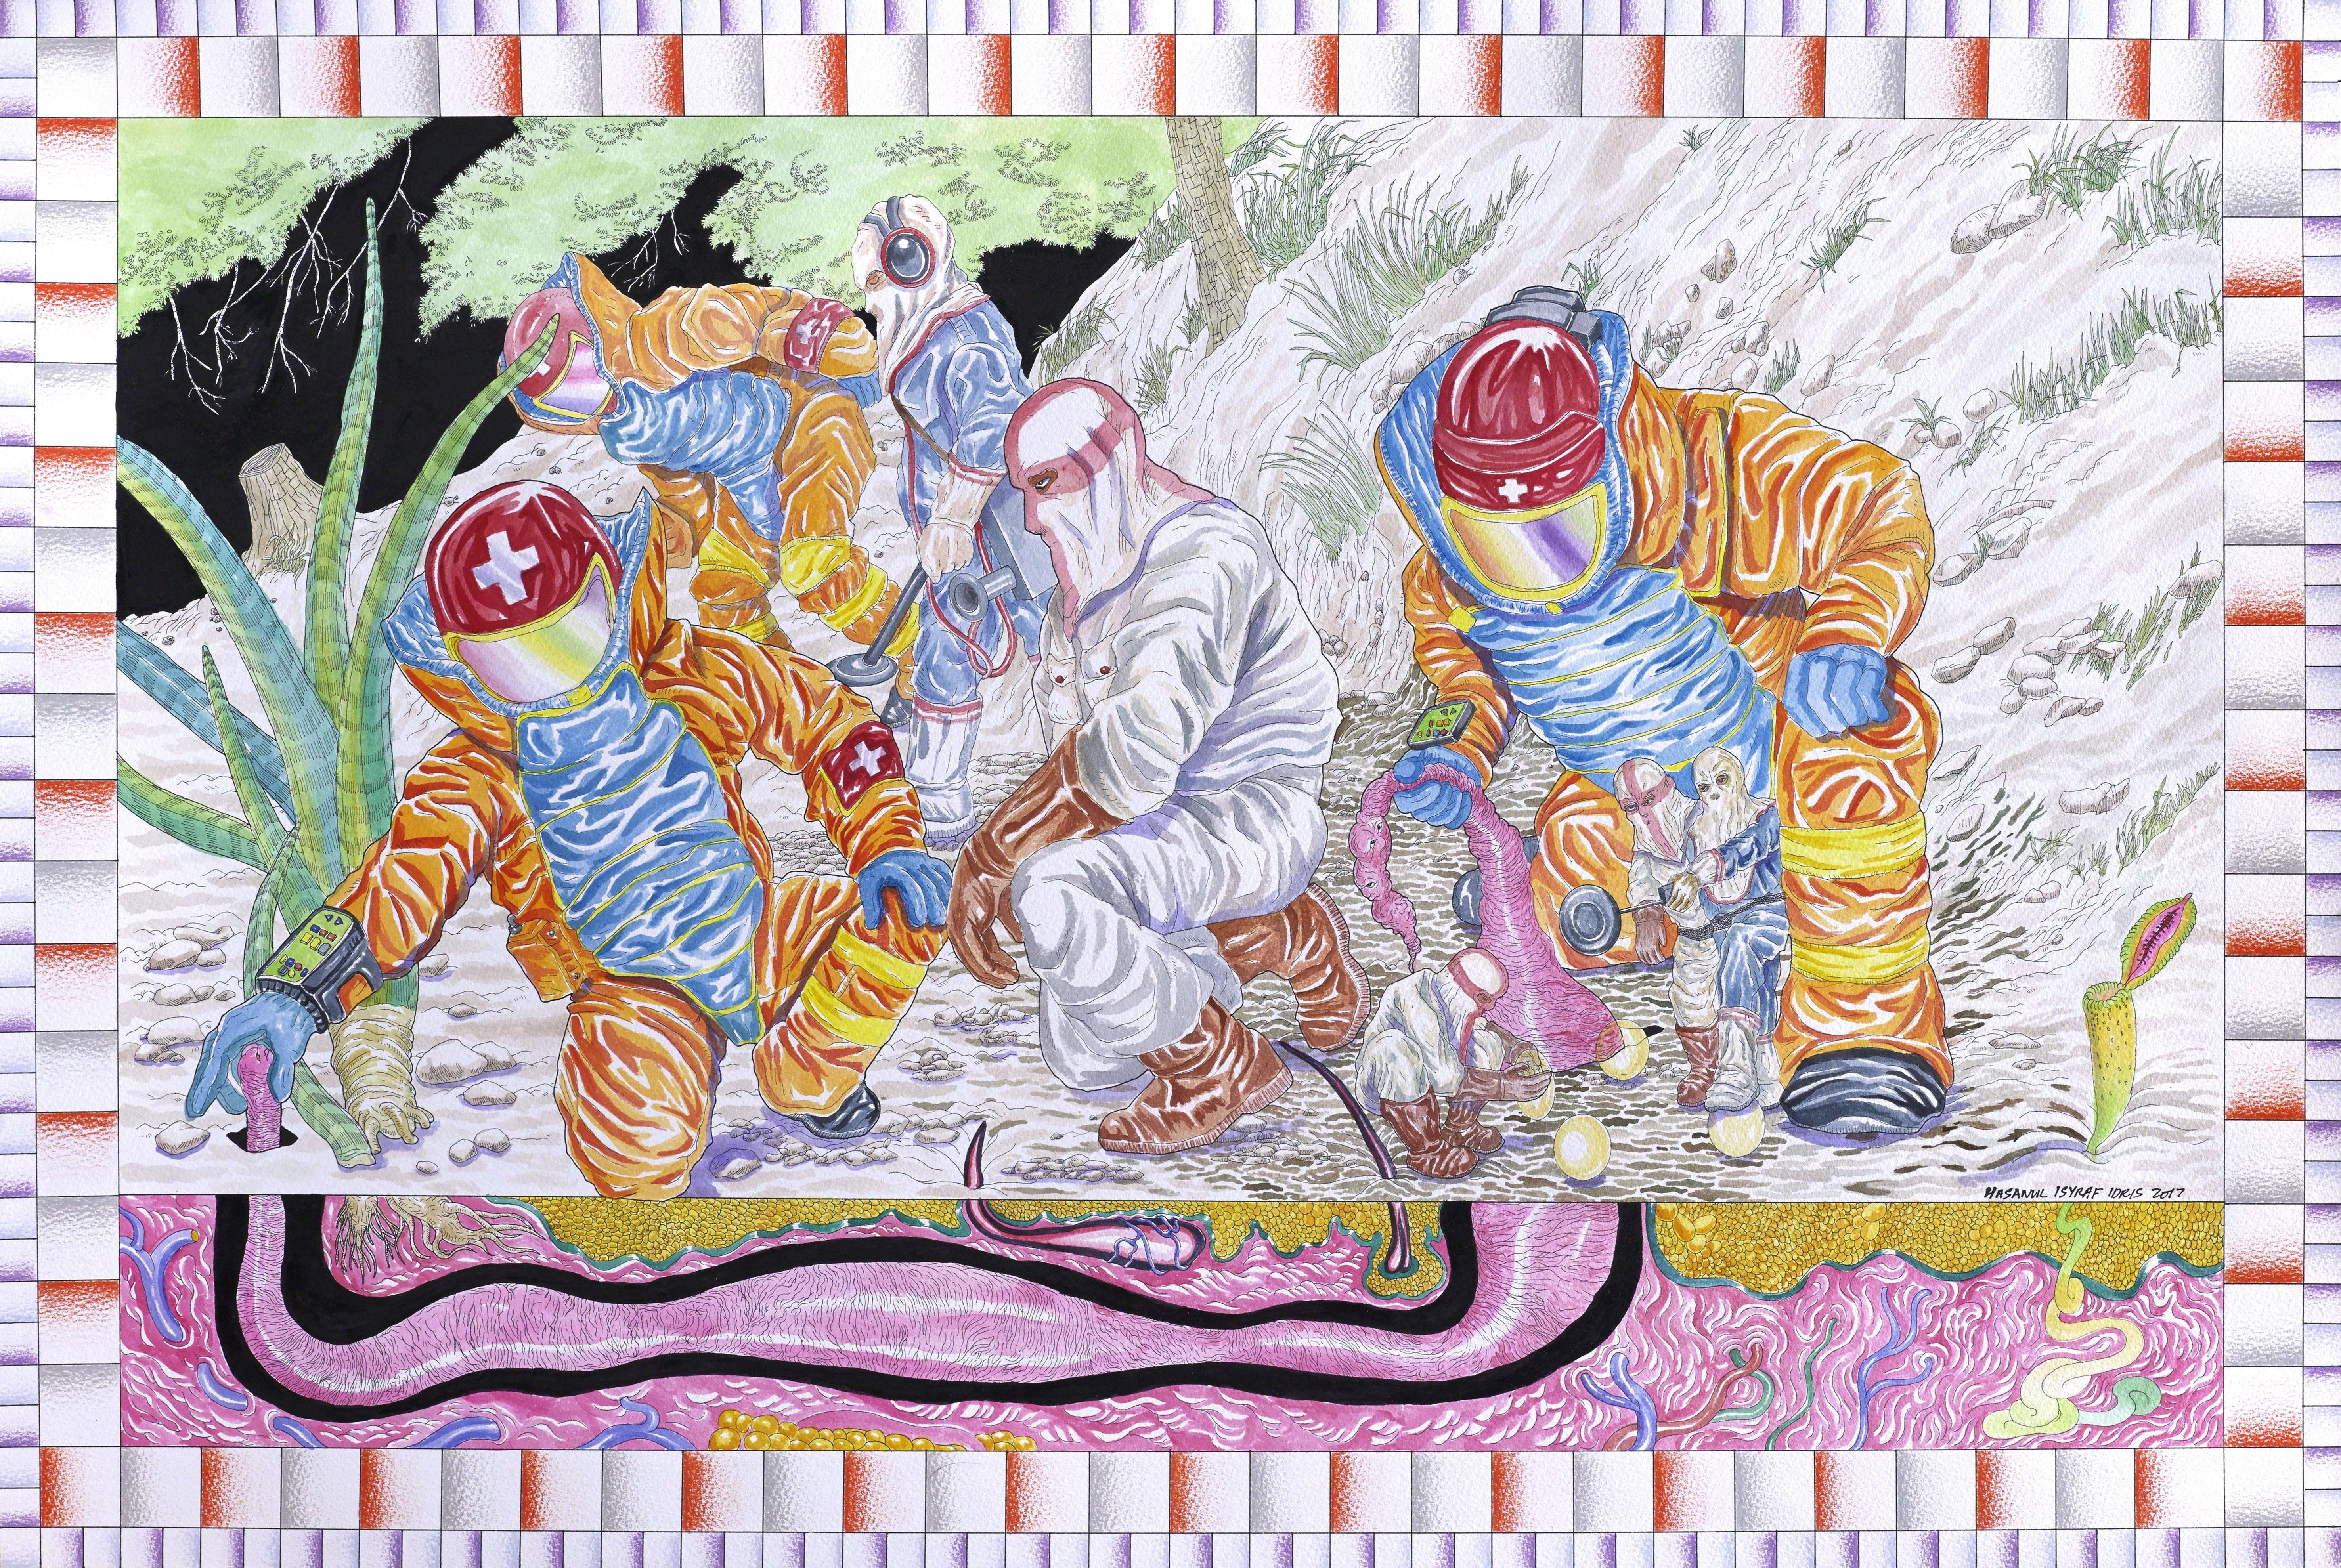 , 'The Most Widespread Dahaga,' 2017, Richard Koh Fine Art